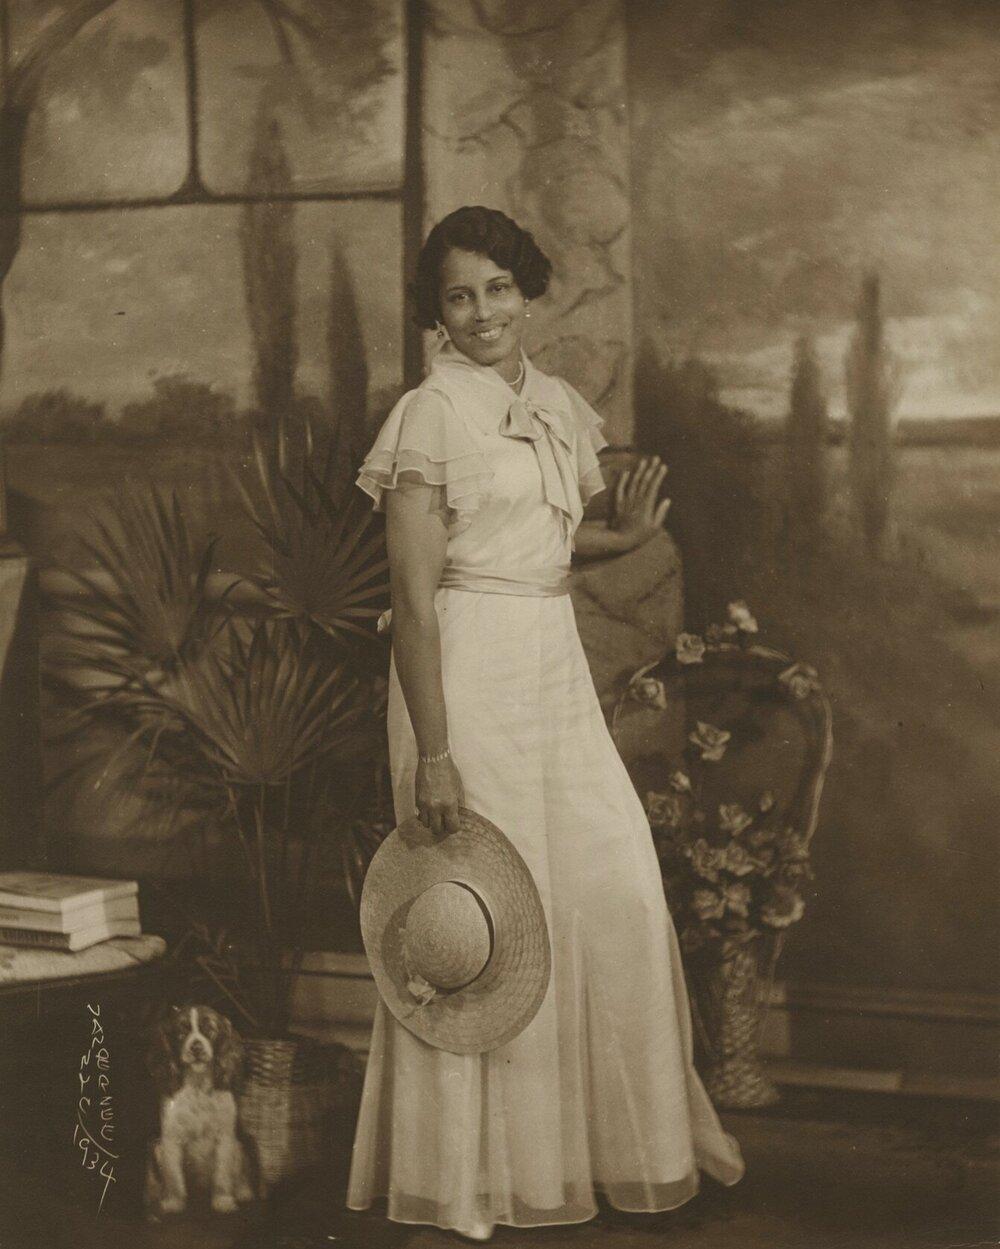 James Van Der Zee, Lady with Wide-brimmed Straw Hat, 1934